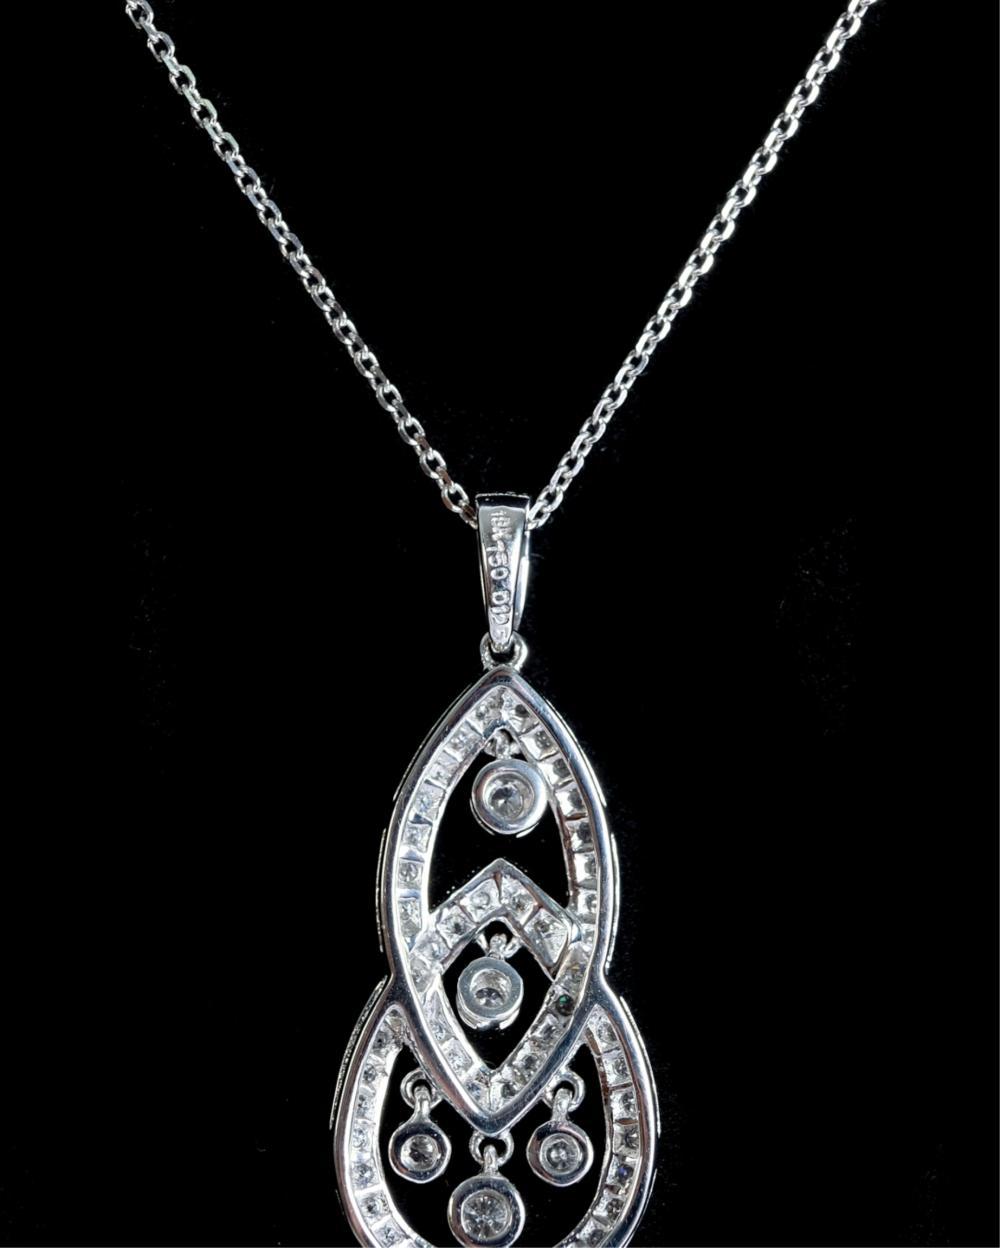 18k White Gold & 1.25 TCW Diamond Pendant Necklace